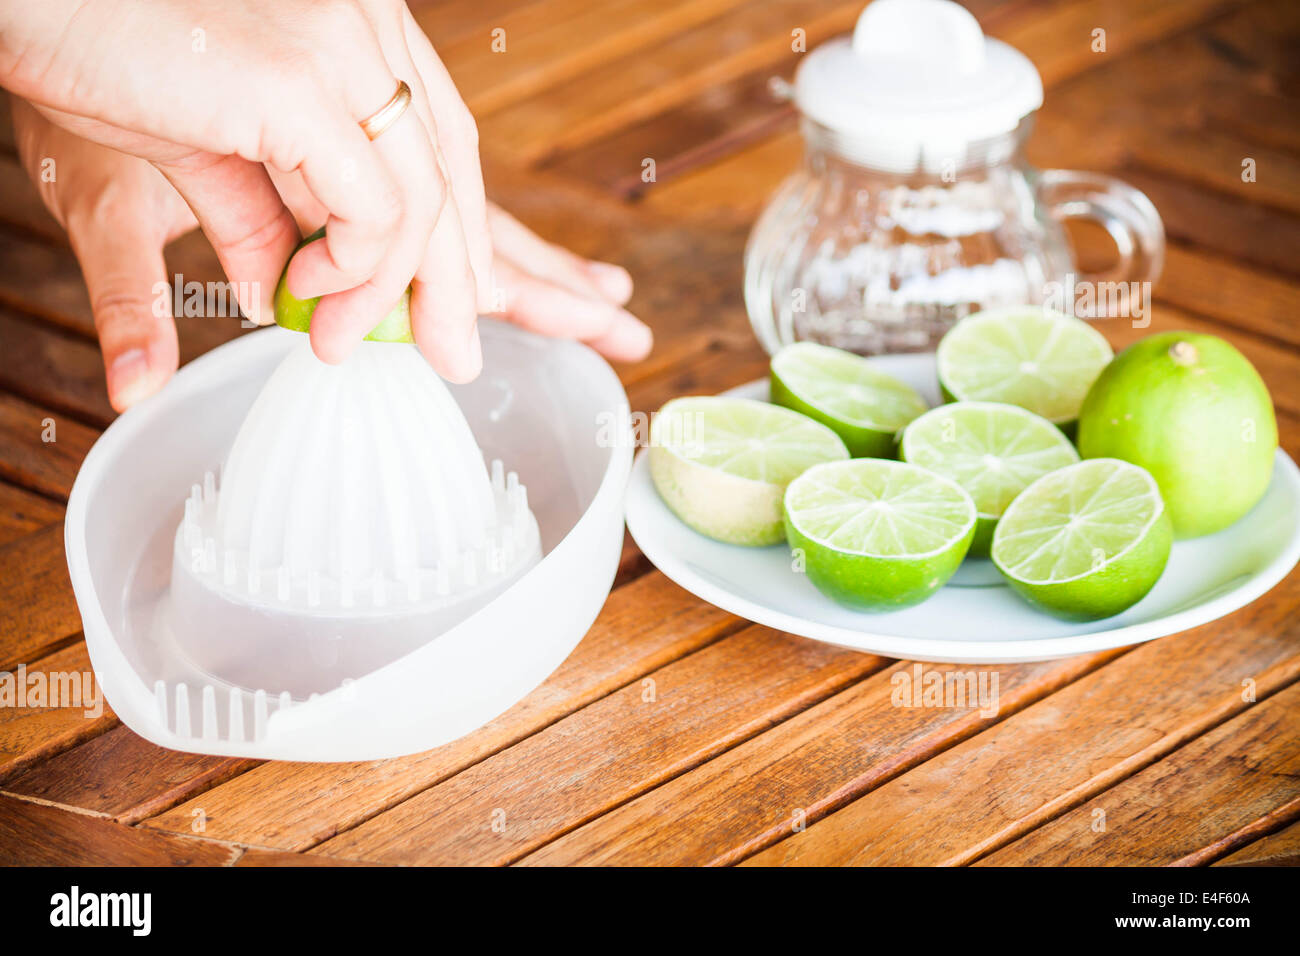 Hand squashing fresh citrus lime on wood table - Stock Image